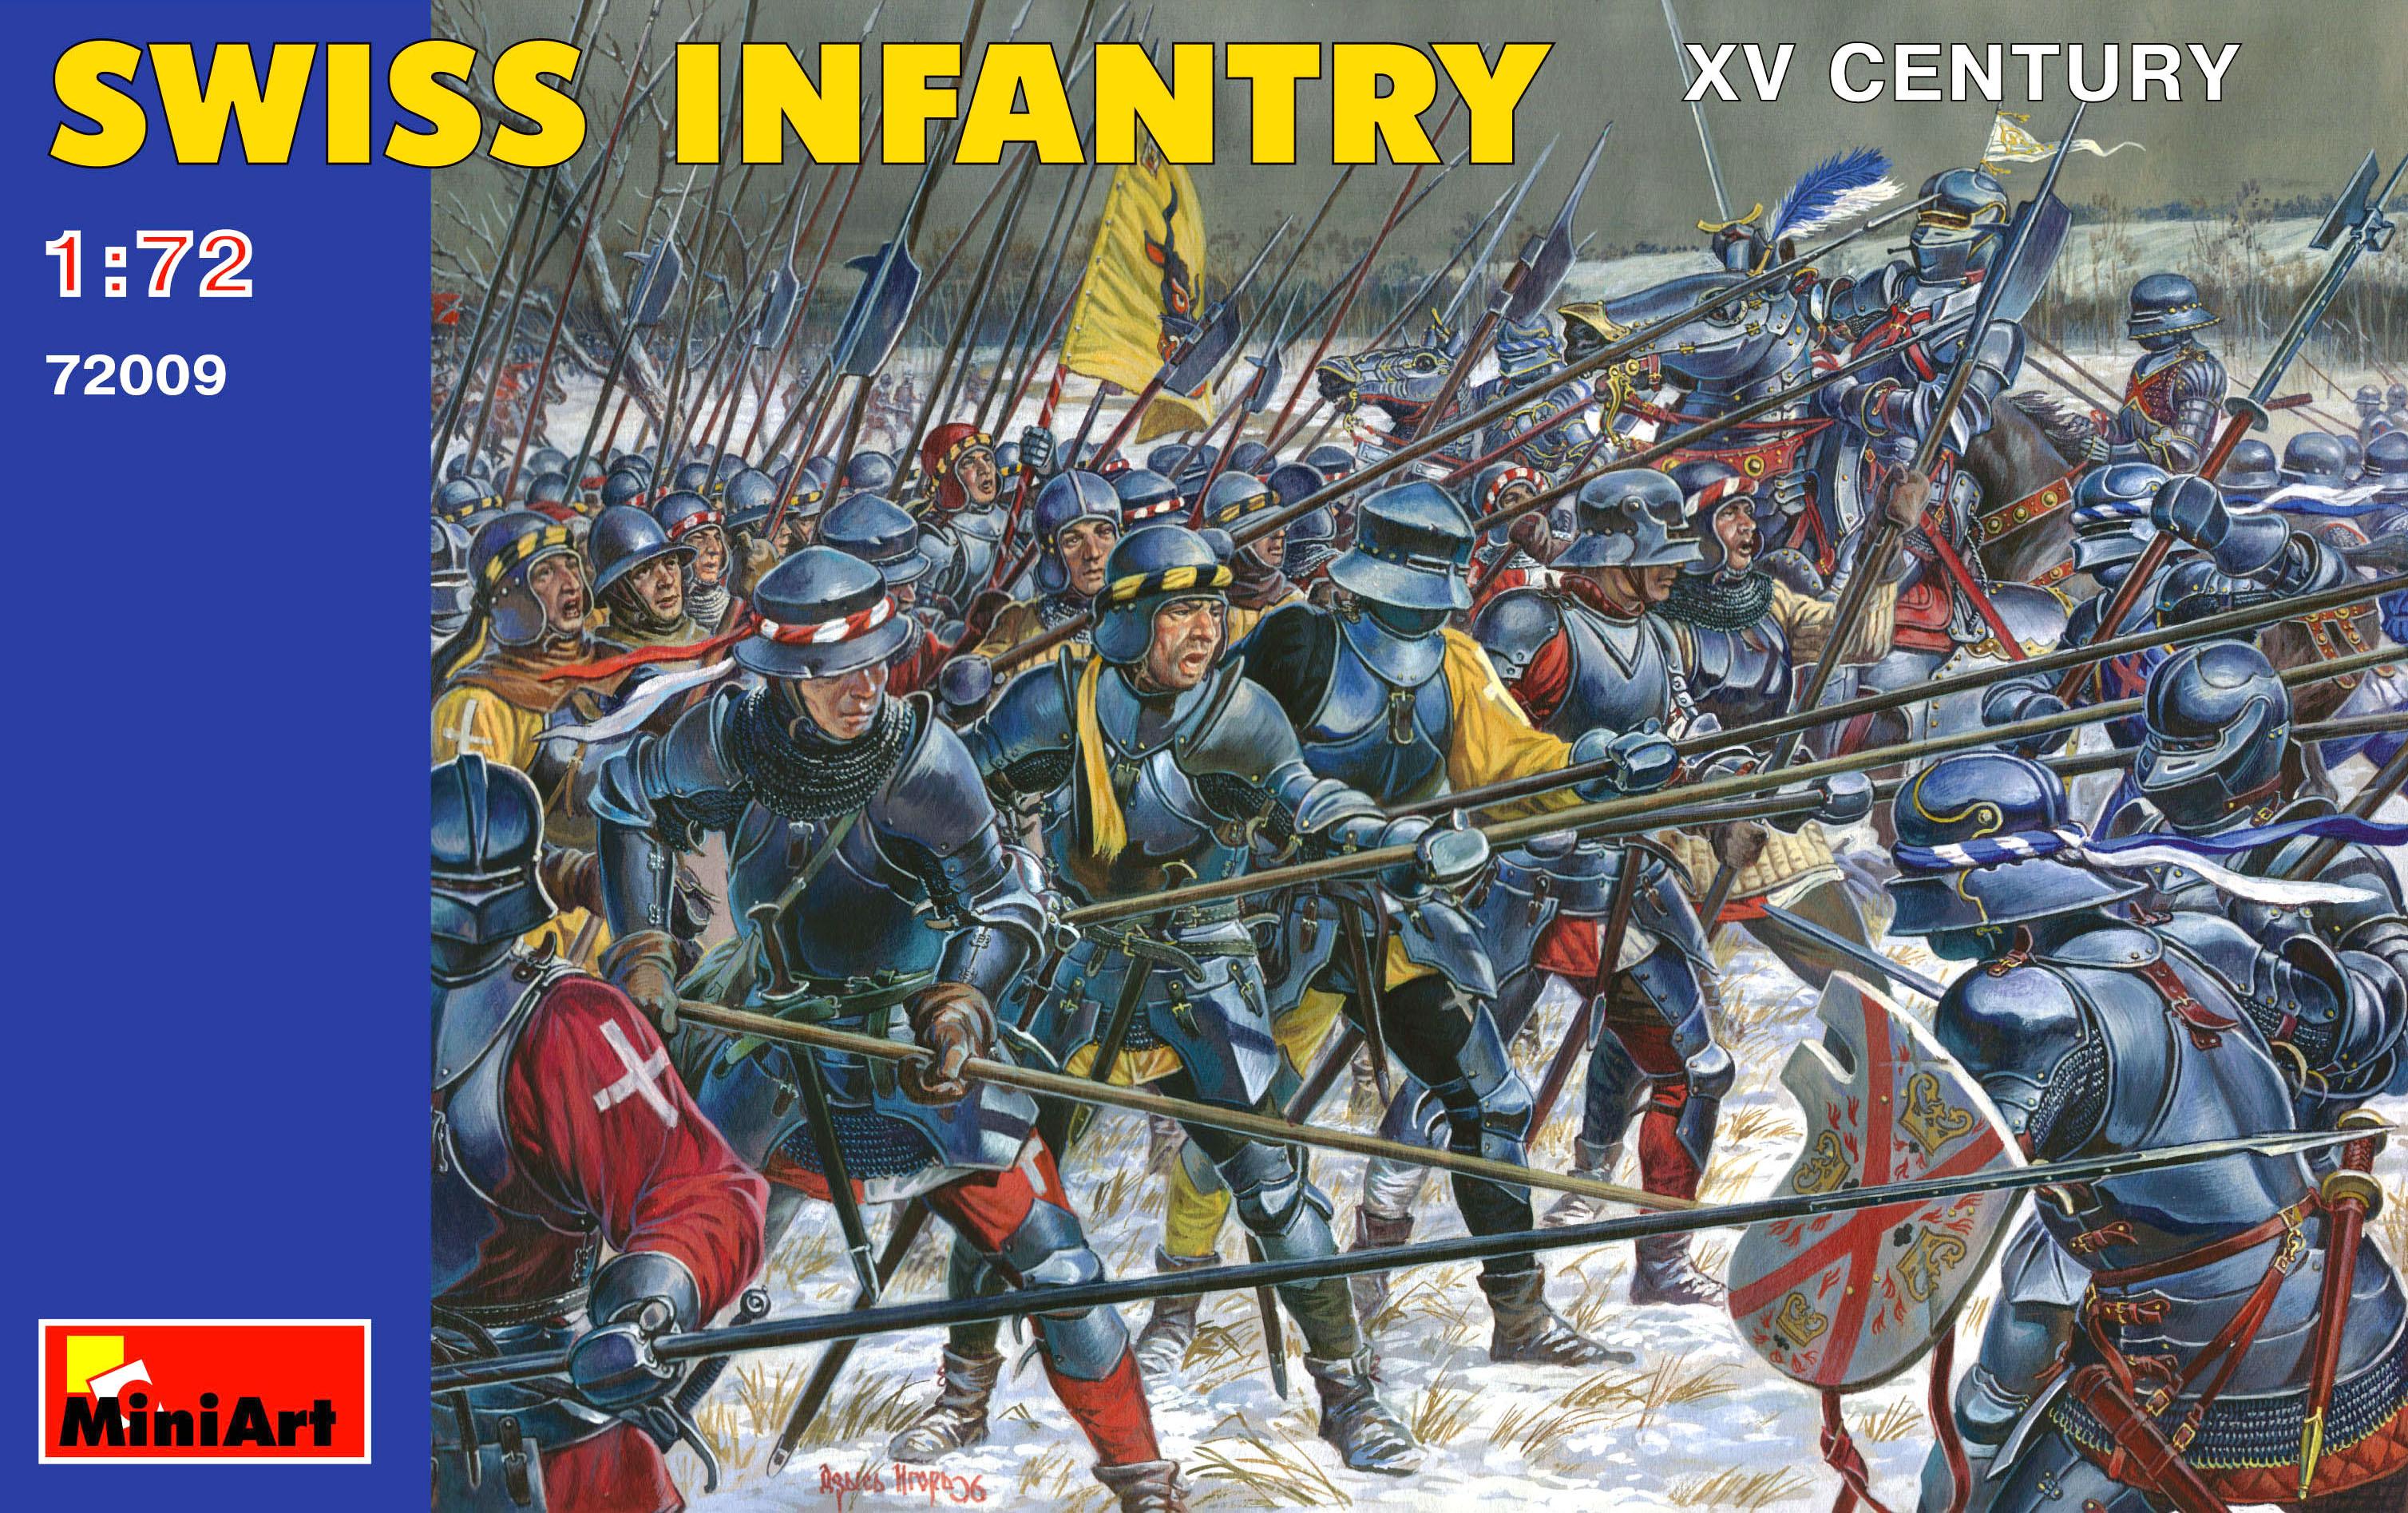 SWISS INFANTRY XV CENTURY